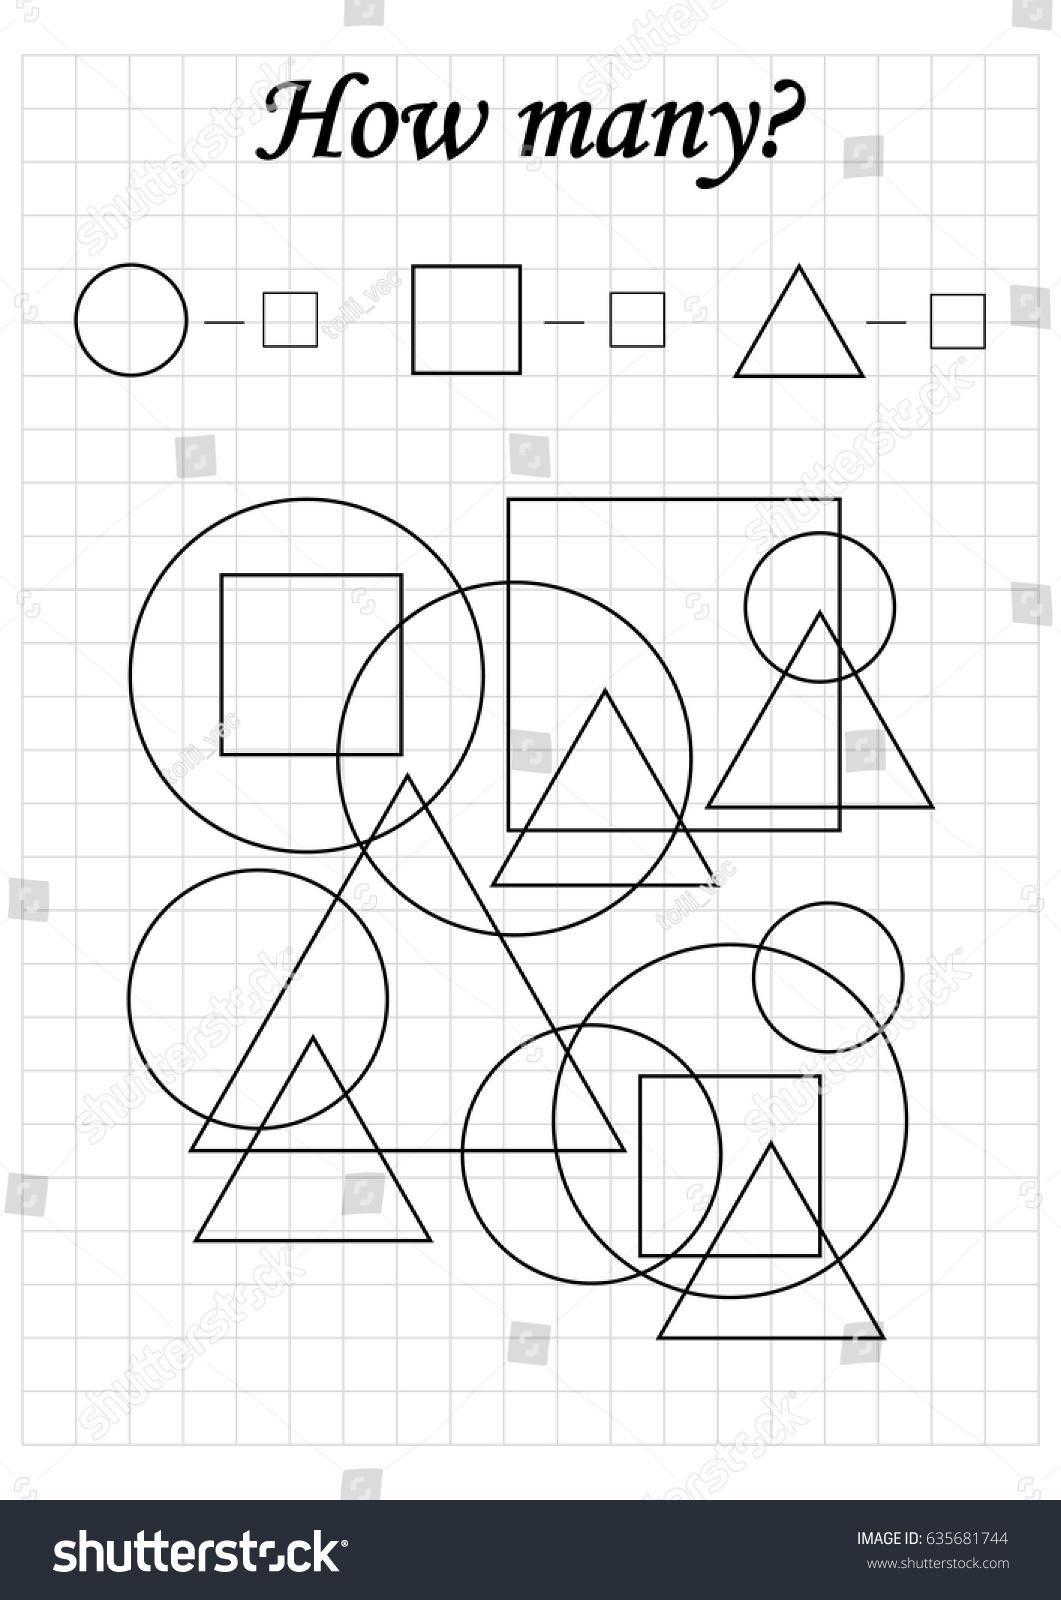 mathematics task how many objects learning stock vector 635681744